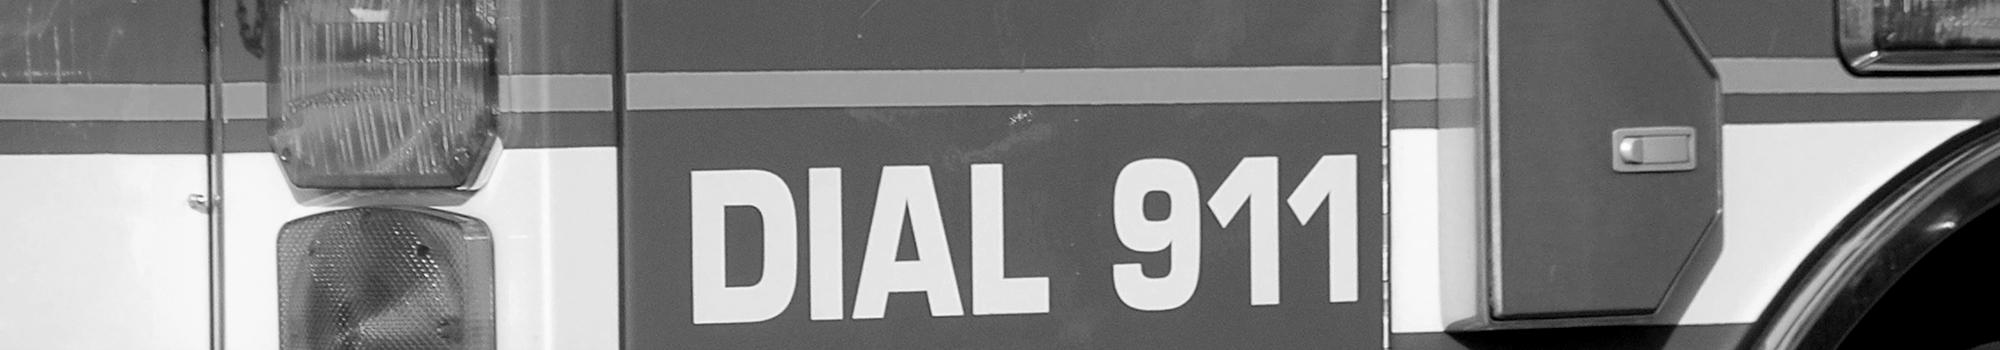 dial-911-header